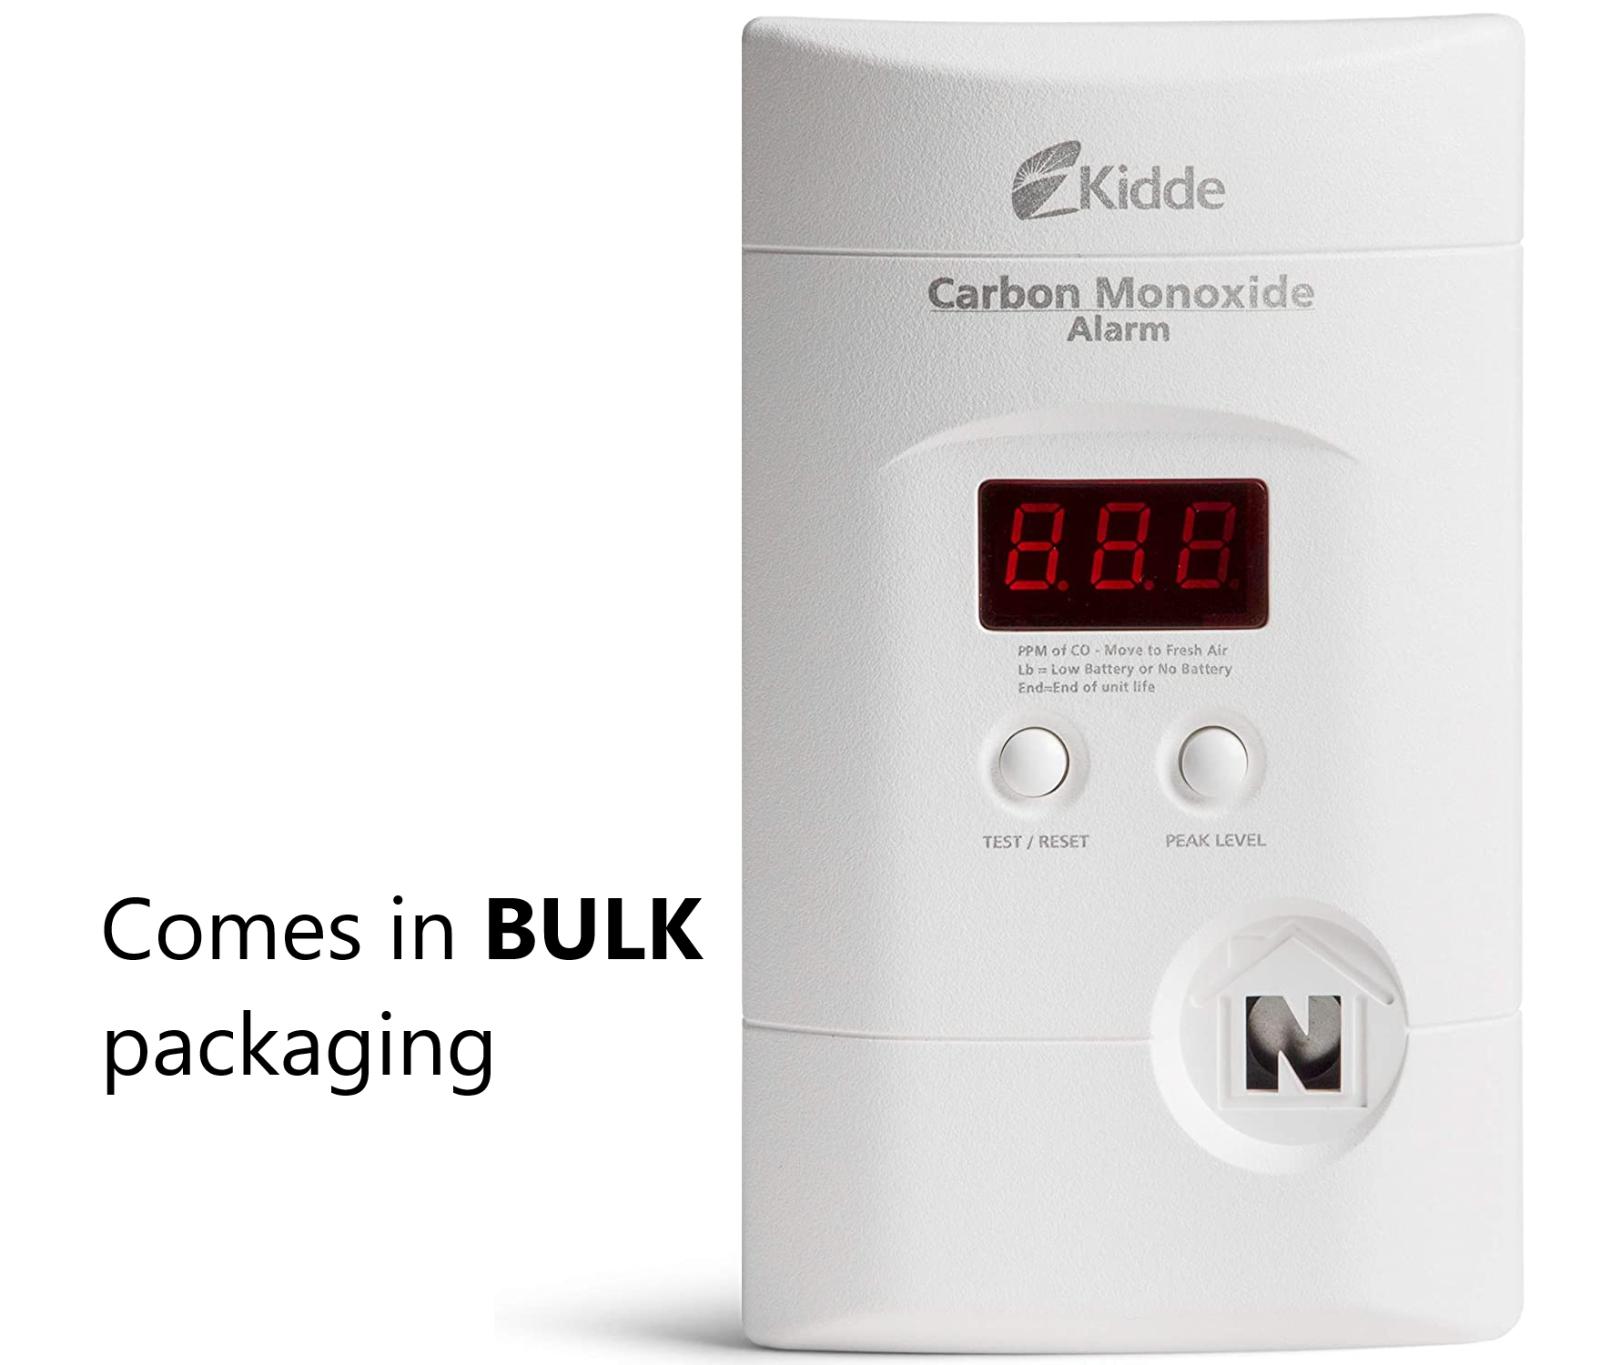 Kidde Nighthawk Plug-In Carbon Monoxide Alarm + Battery Back